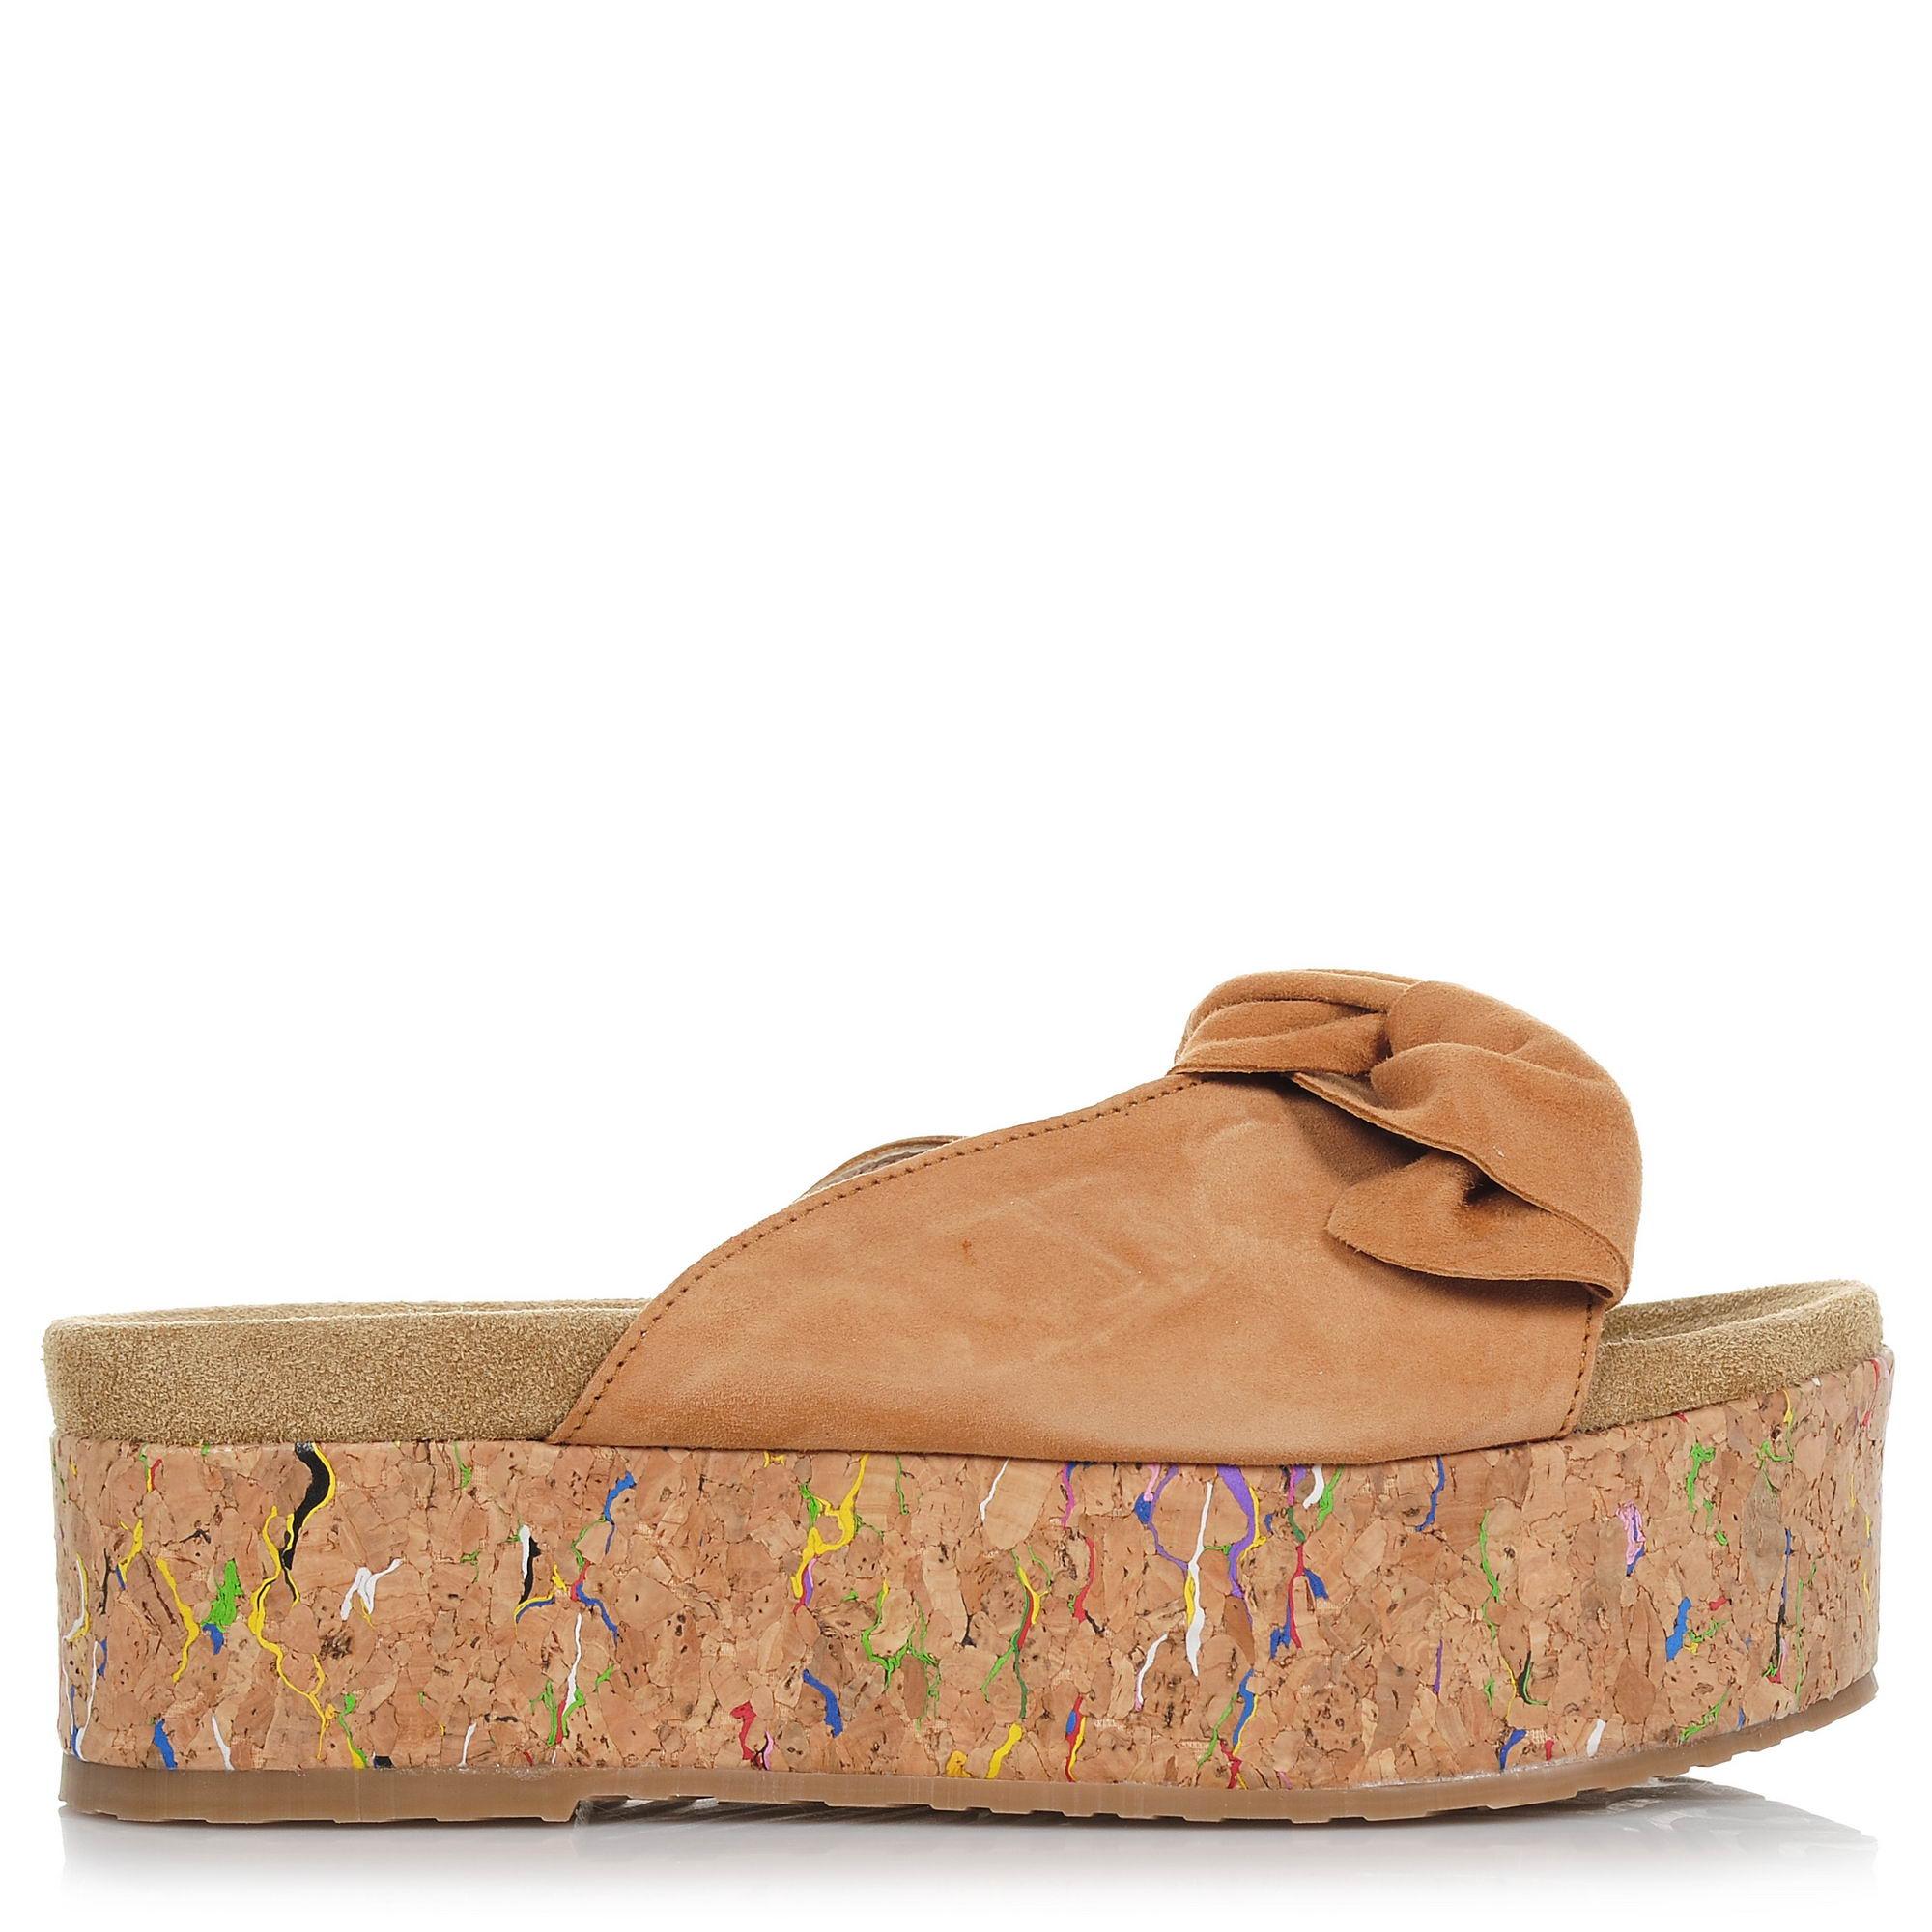 Suede Δερμάτινα Flatforms Nitro Fashion SX1022N γυναικα   γυναικείο παπούτσι